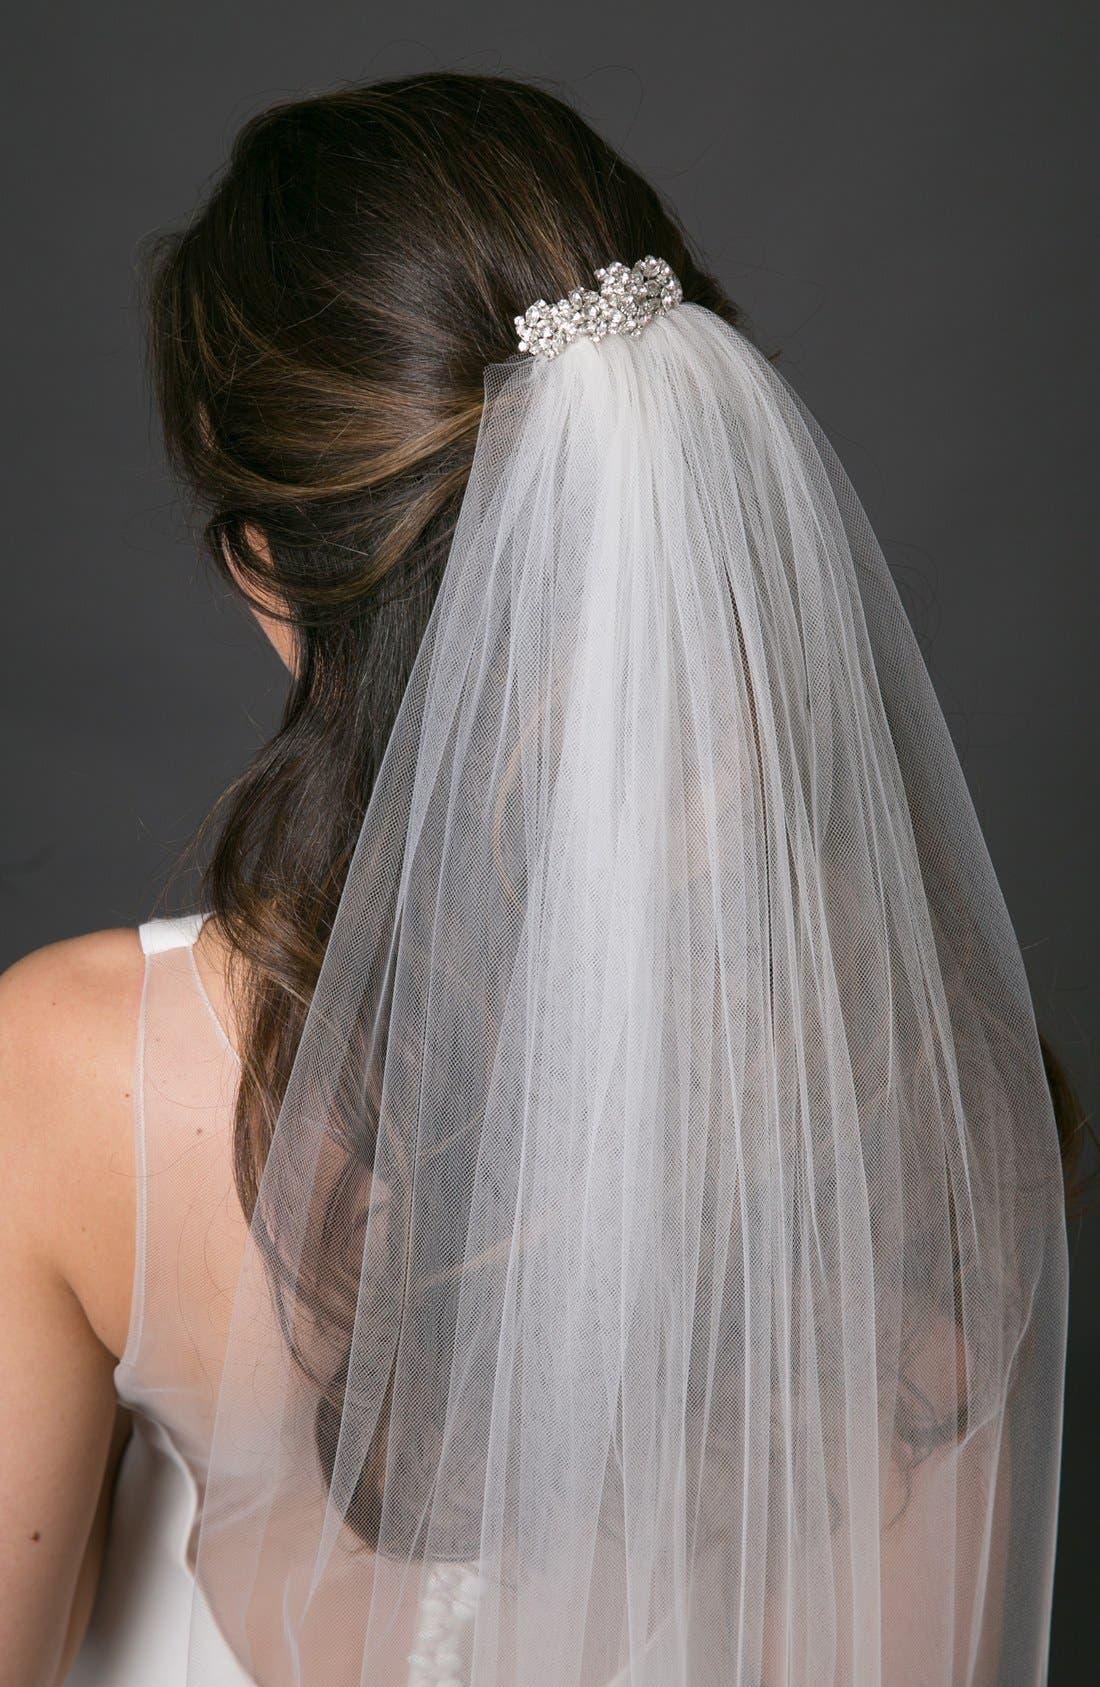 Alternate Image 2  - Toni Federici 'Sugar Pie' Embellished Hair Comb with Waltz Length Veil